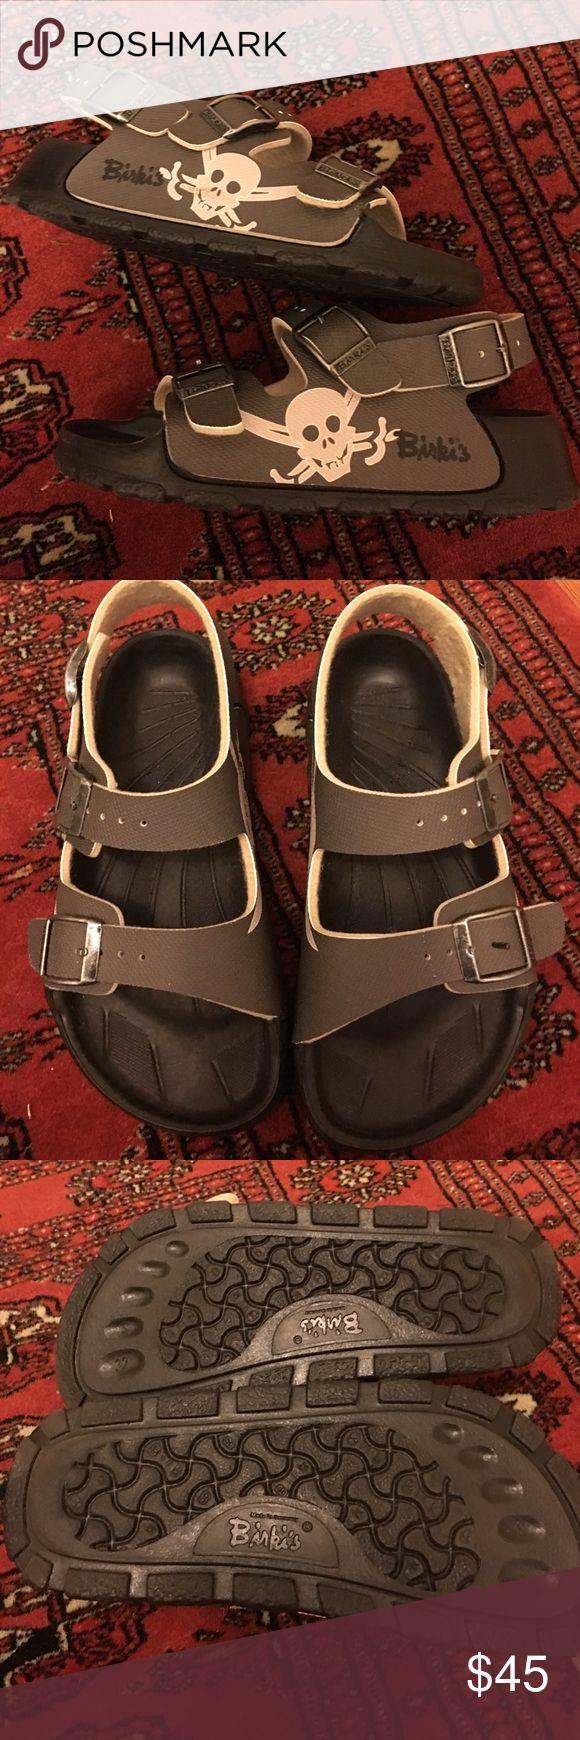 NWT kids Birki sandals sz 32 (1-1.5 US) Super cool dark green Birki sandal- with skull/cross.  Hard to find in US - but are best sandals for kids. Waterproof and comfortable. Birkenstock Shoes Sandals & Flip Flops